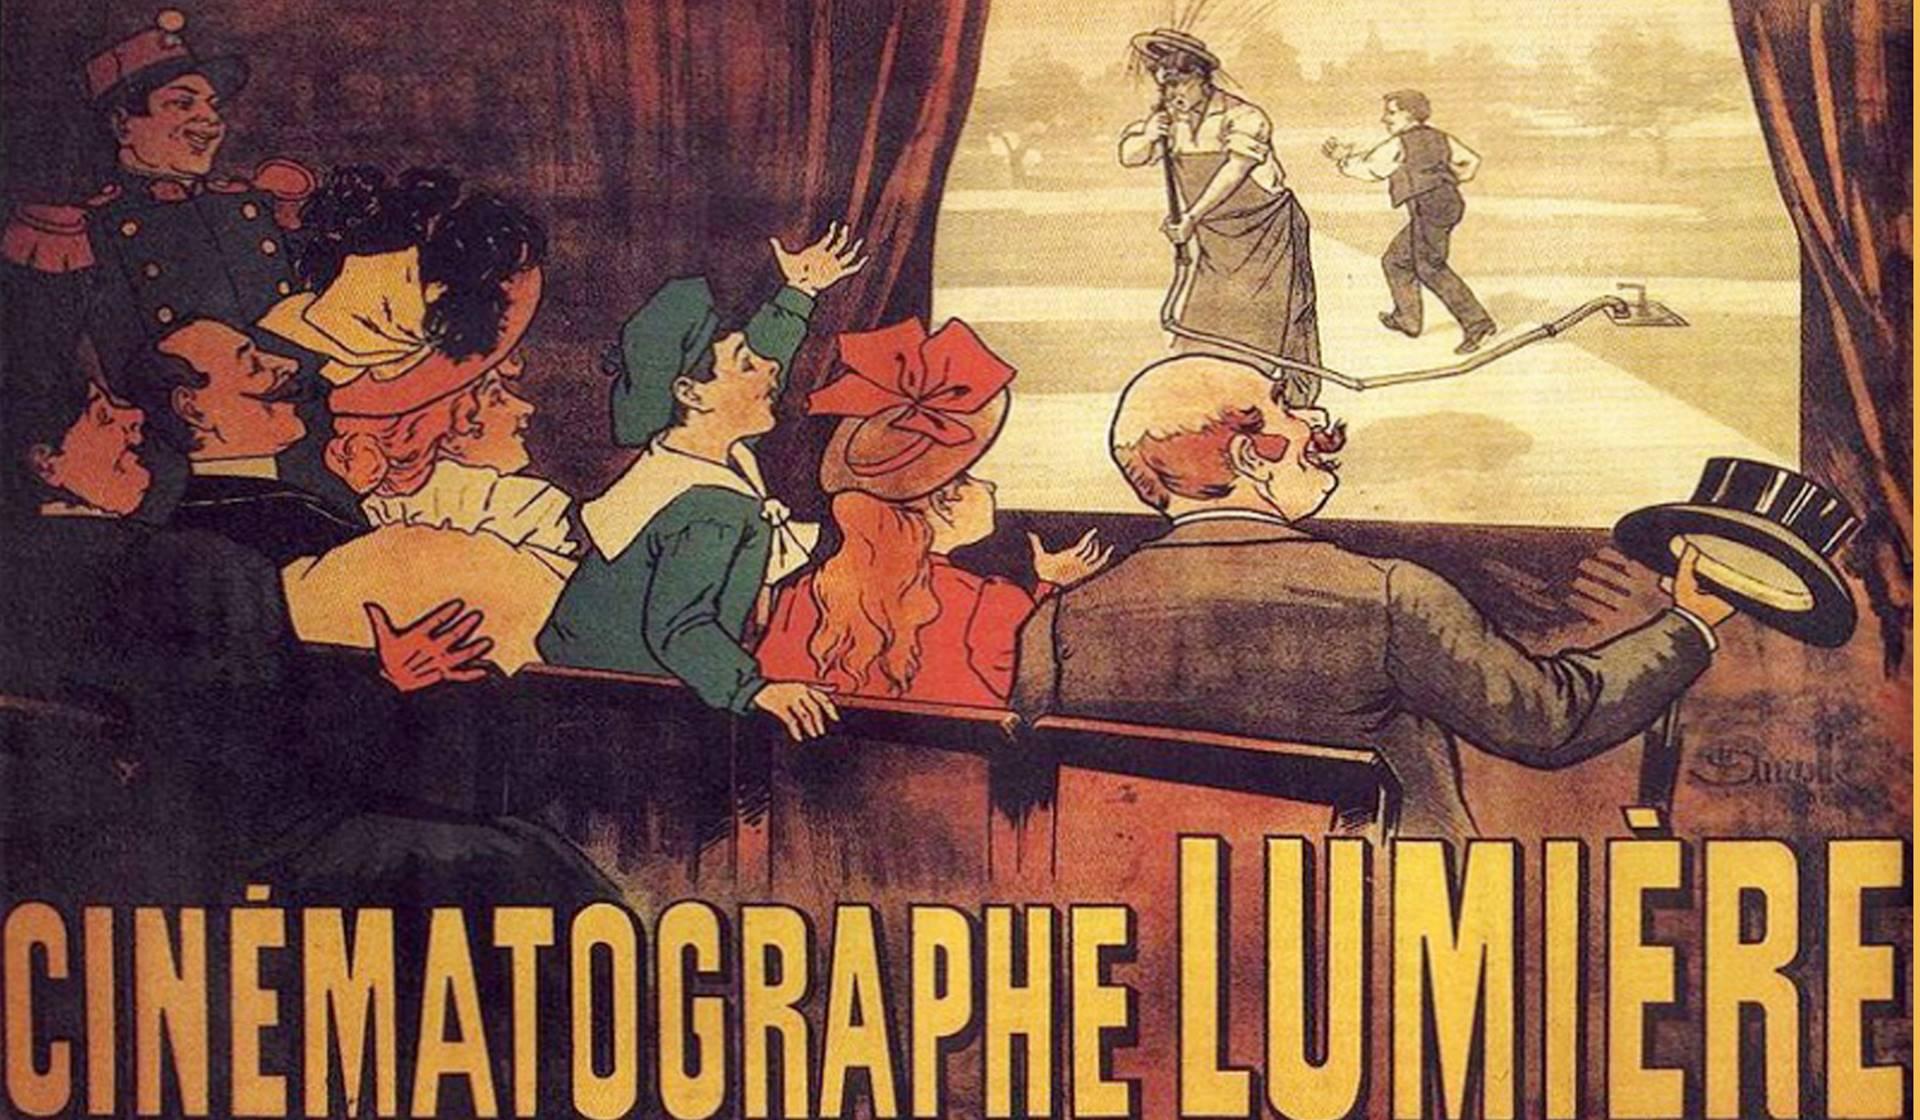 Furius Fan vs. La salida de los obreros de Lumière